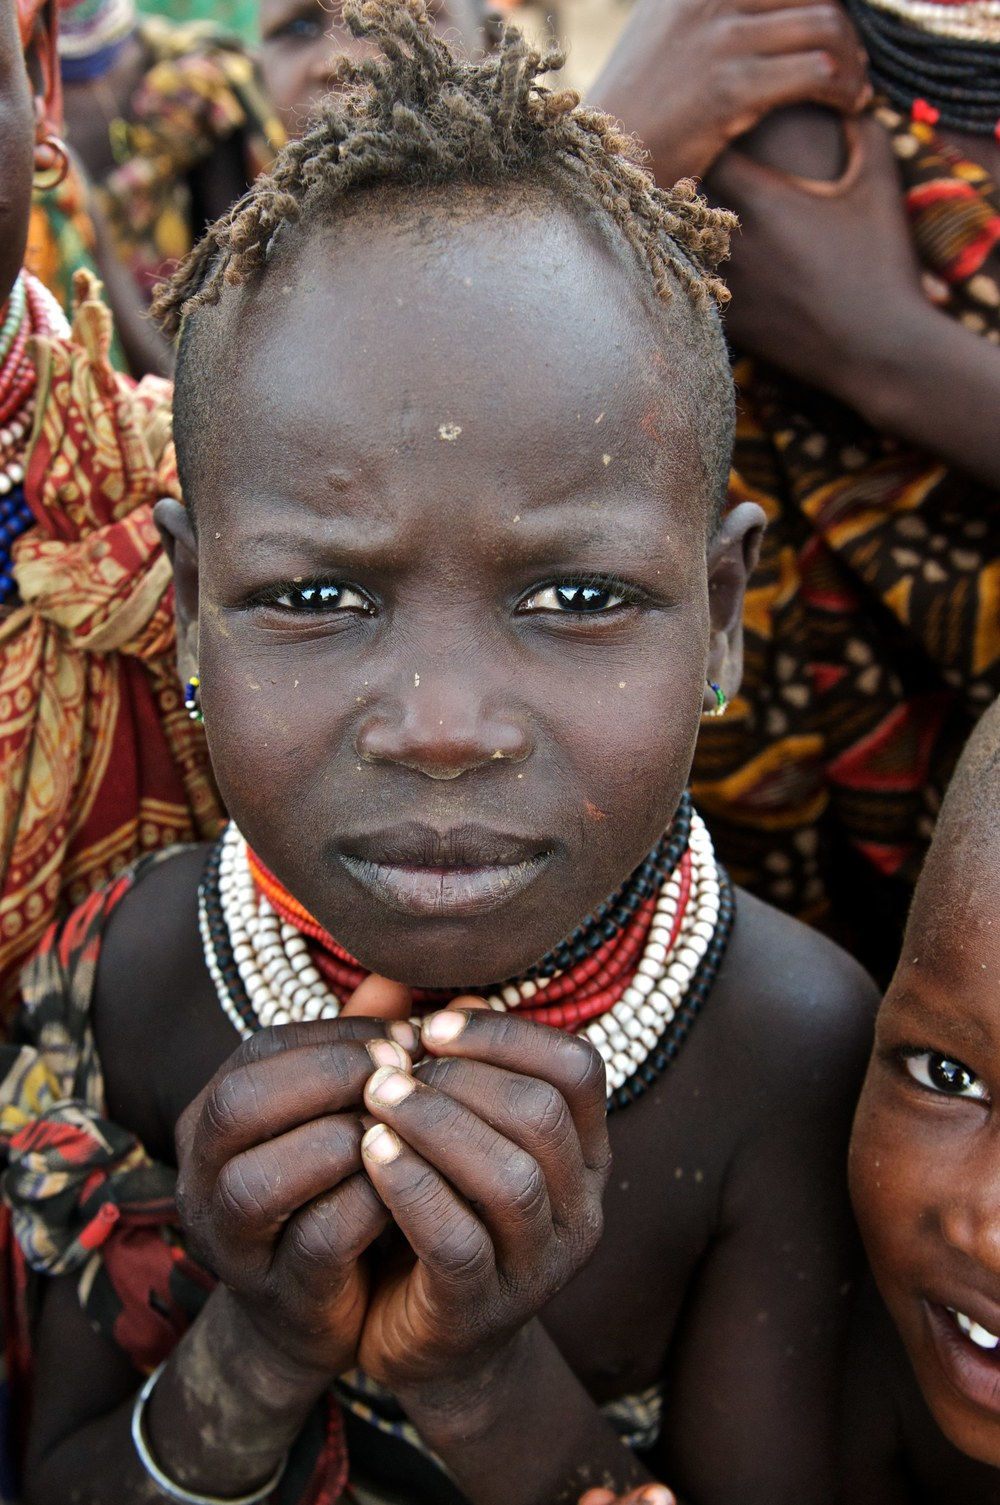 AE_Turkana_0911_2765.jpg